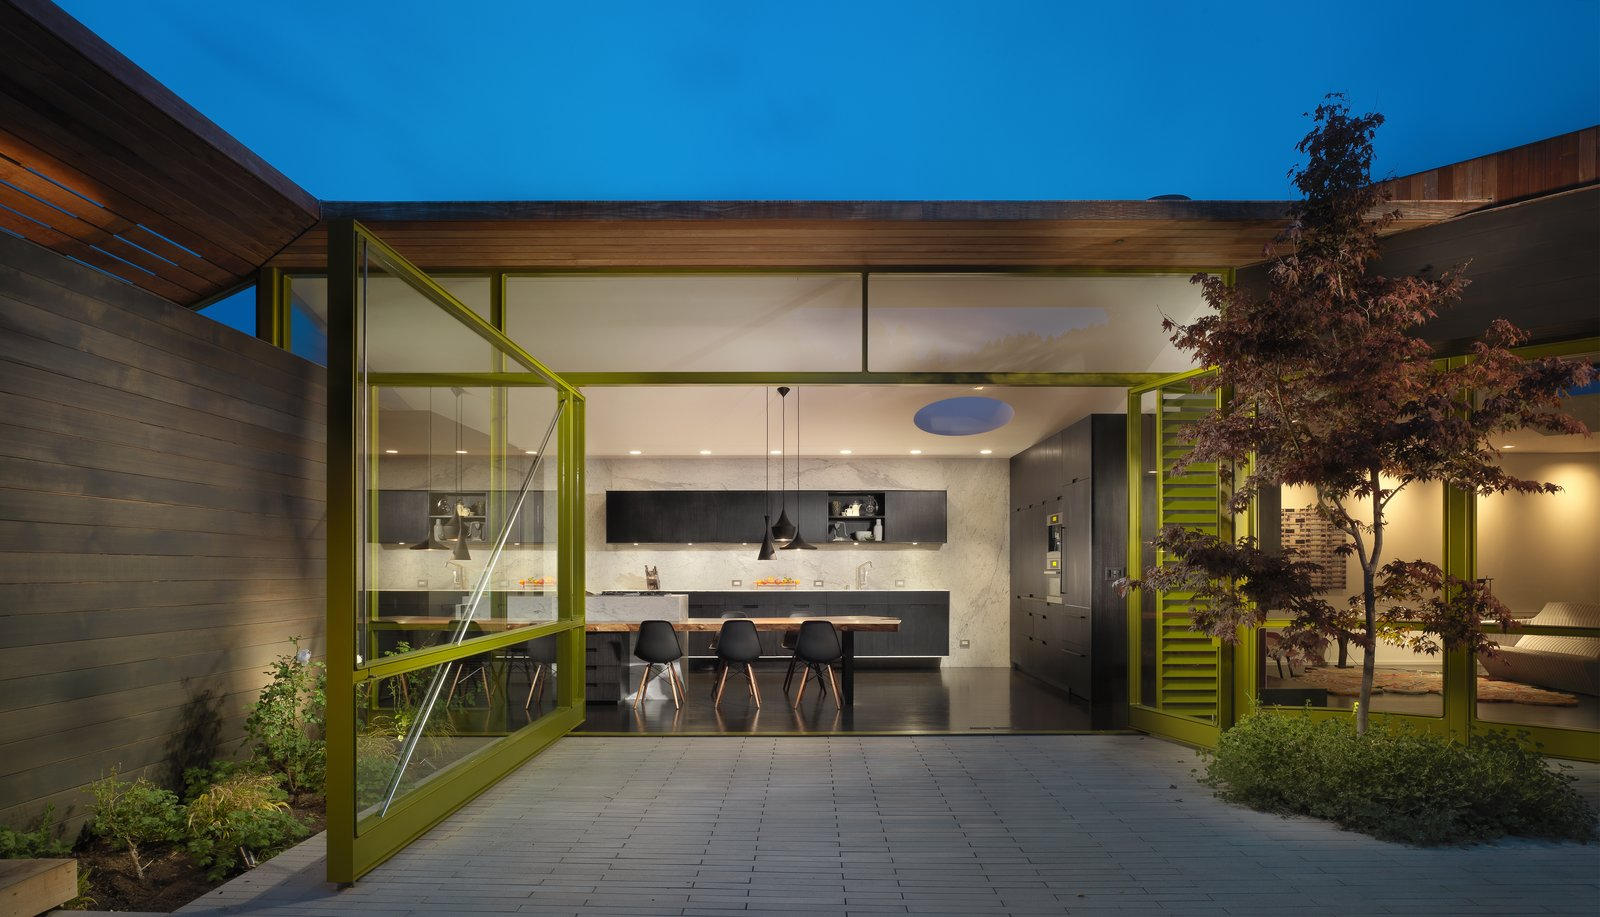 MV House by Chris Deam